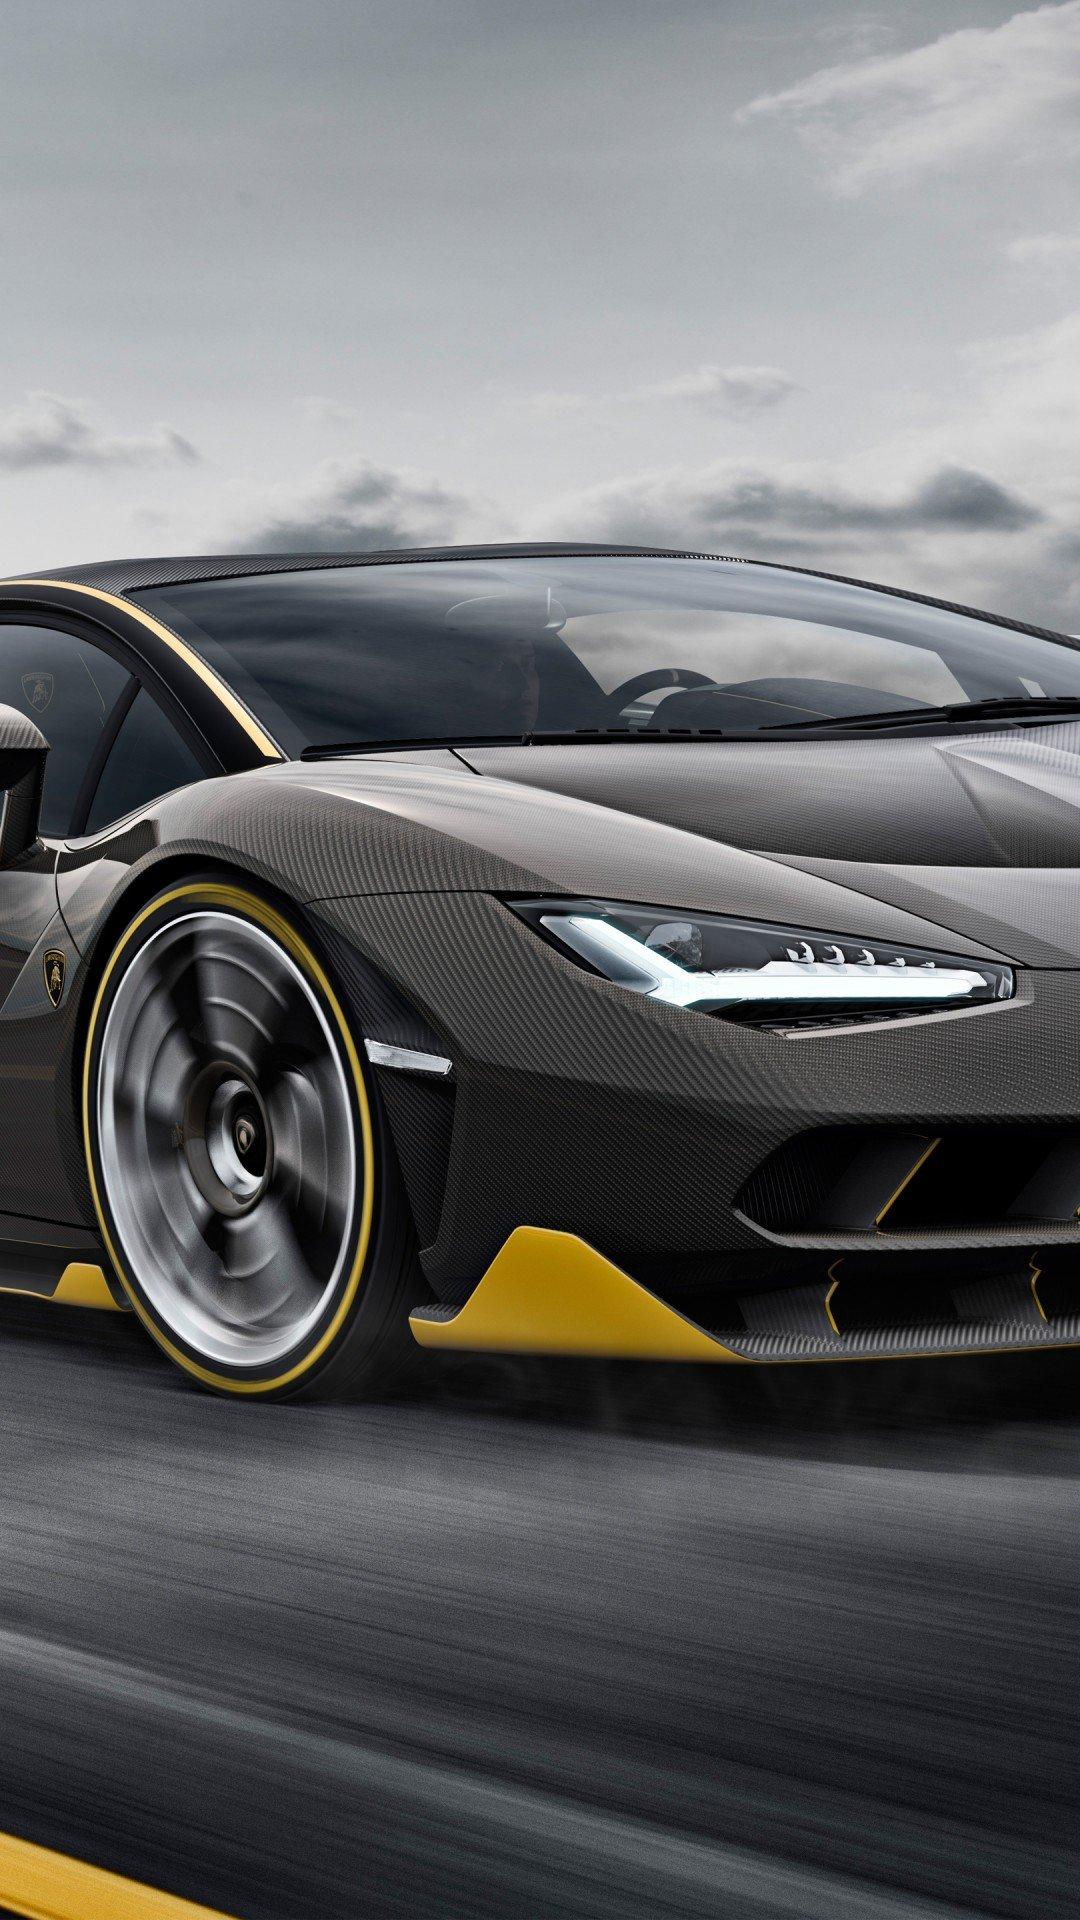 Lamborghini Cell screen saver wallpaper